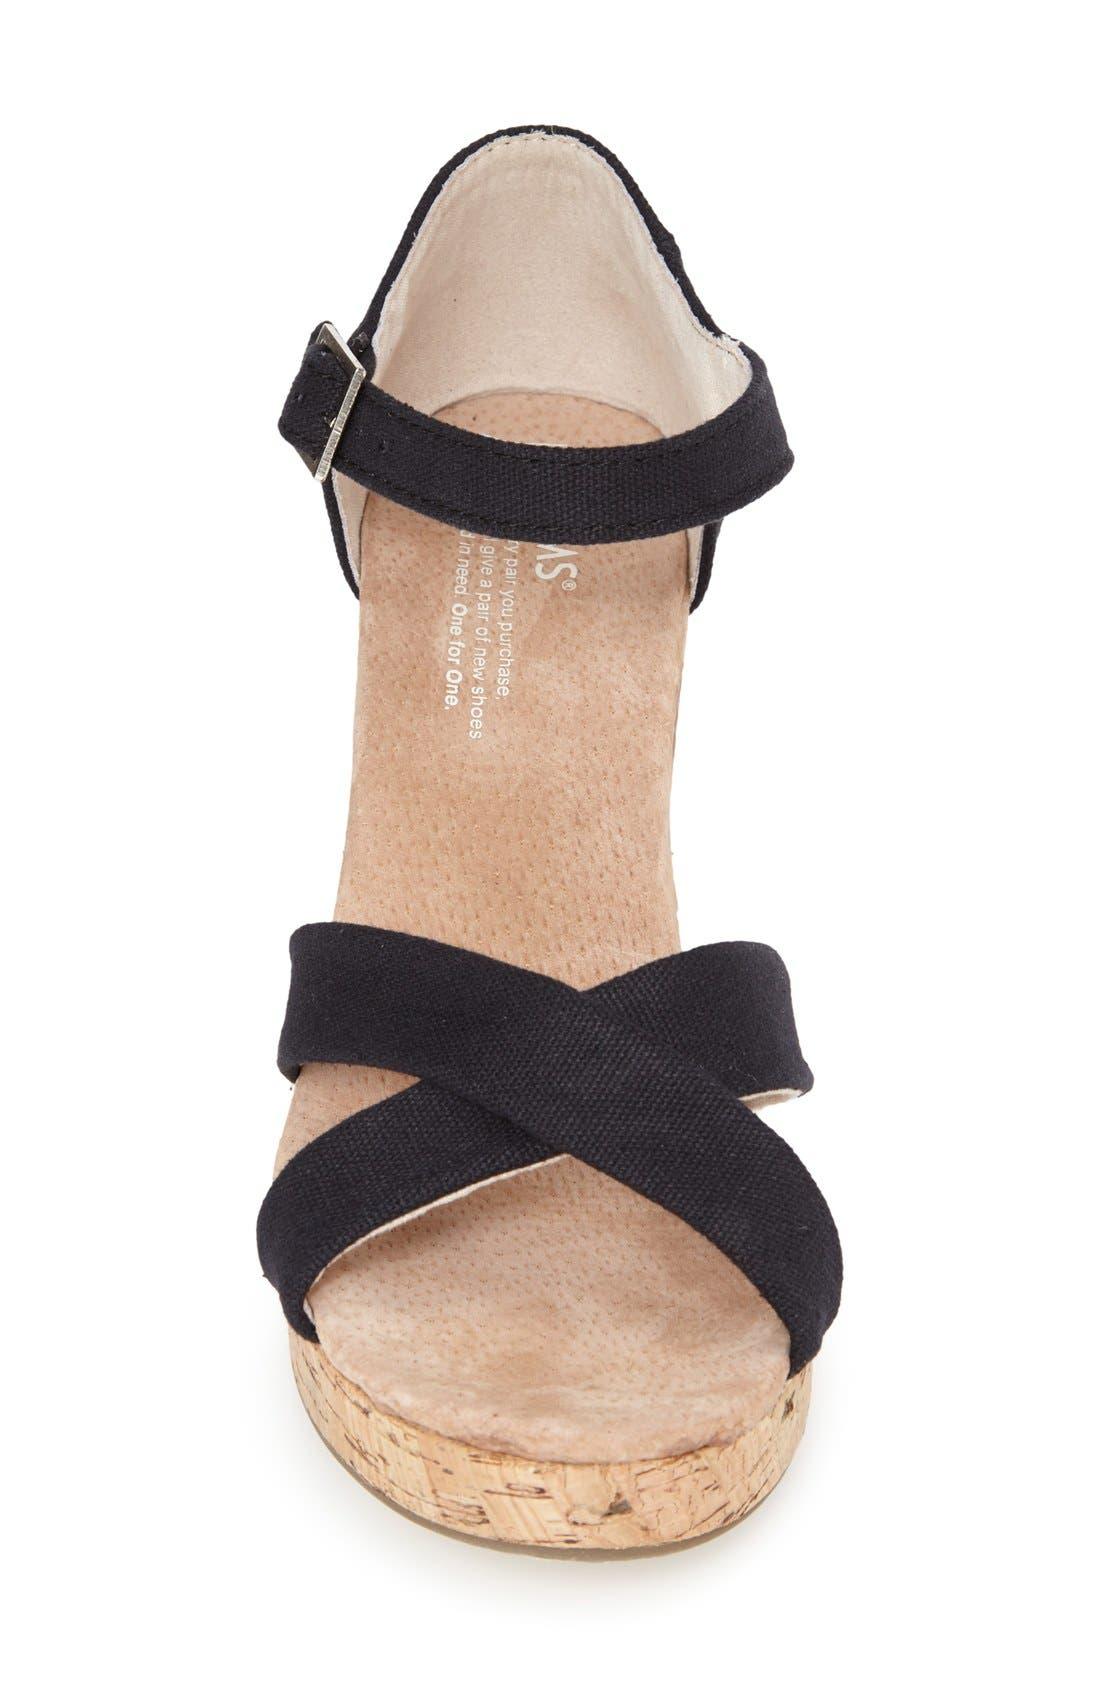 Canvas Ankle Strap Wedge Sandal,                             Alternate thumbnail 2, color,                             001